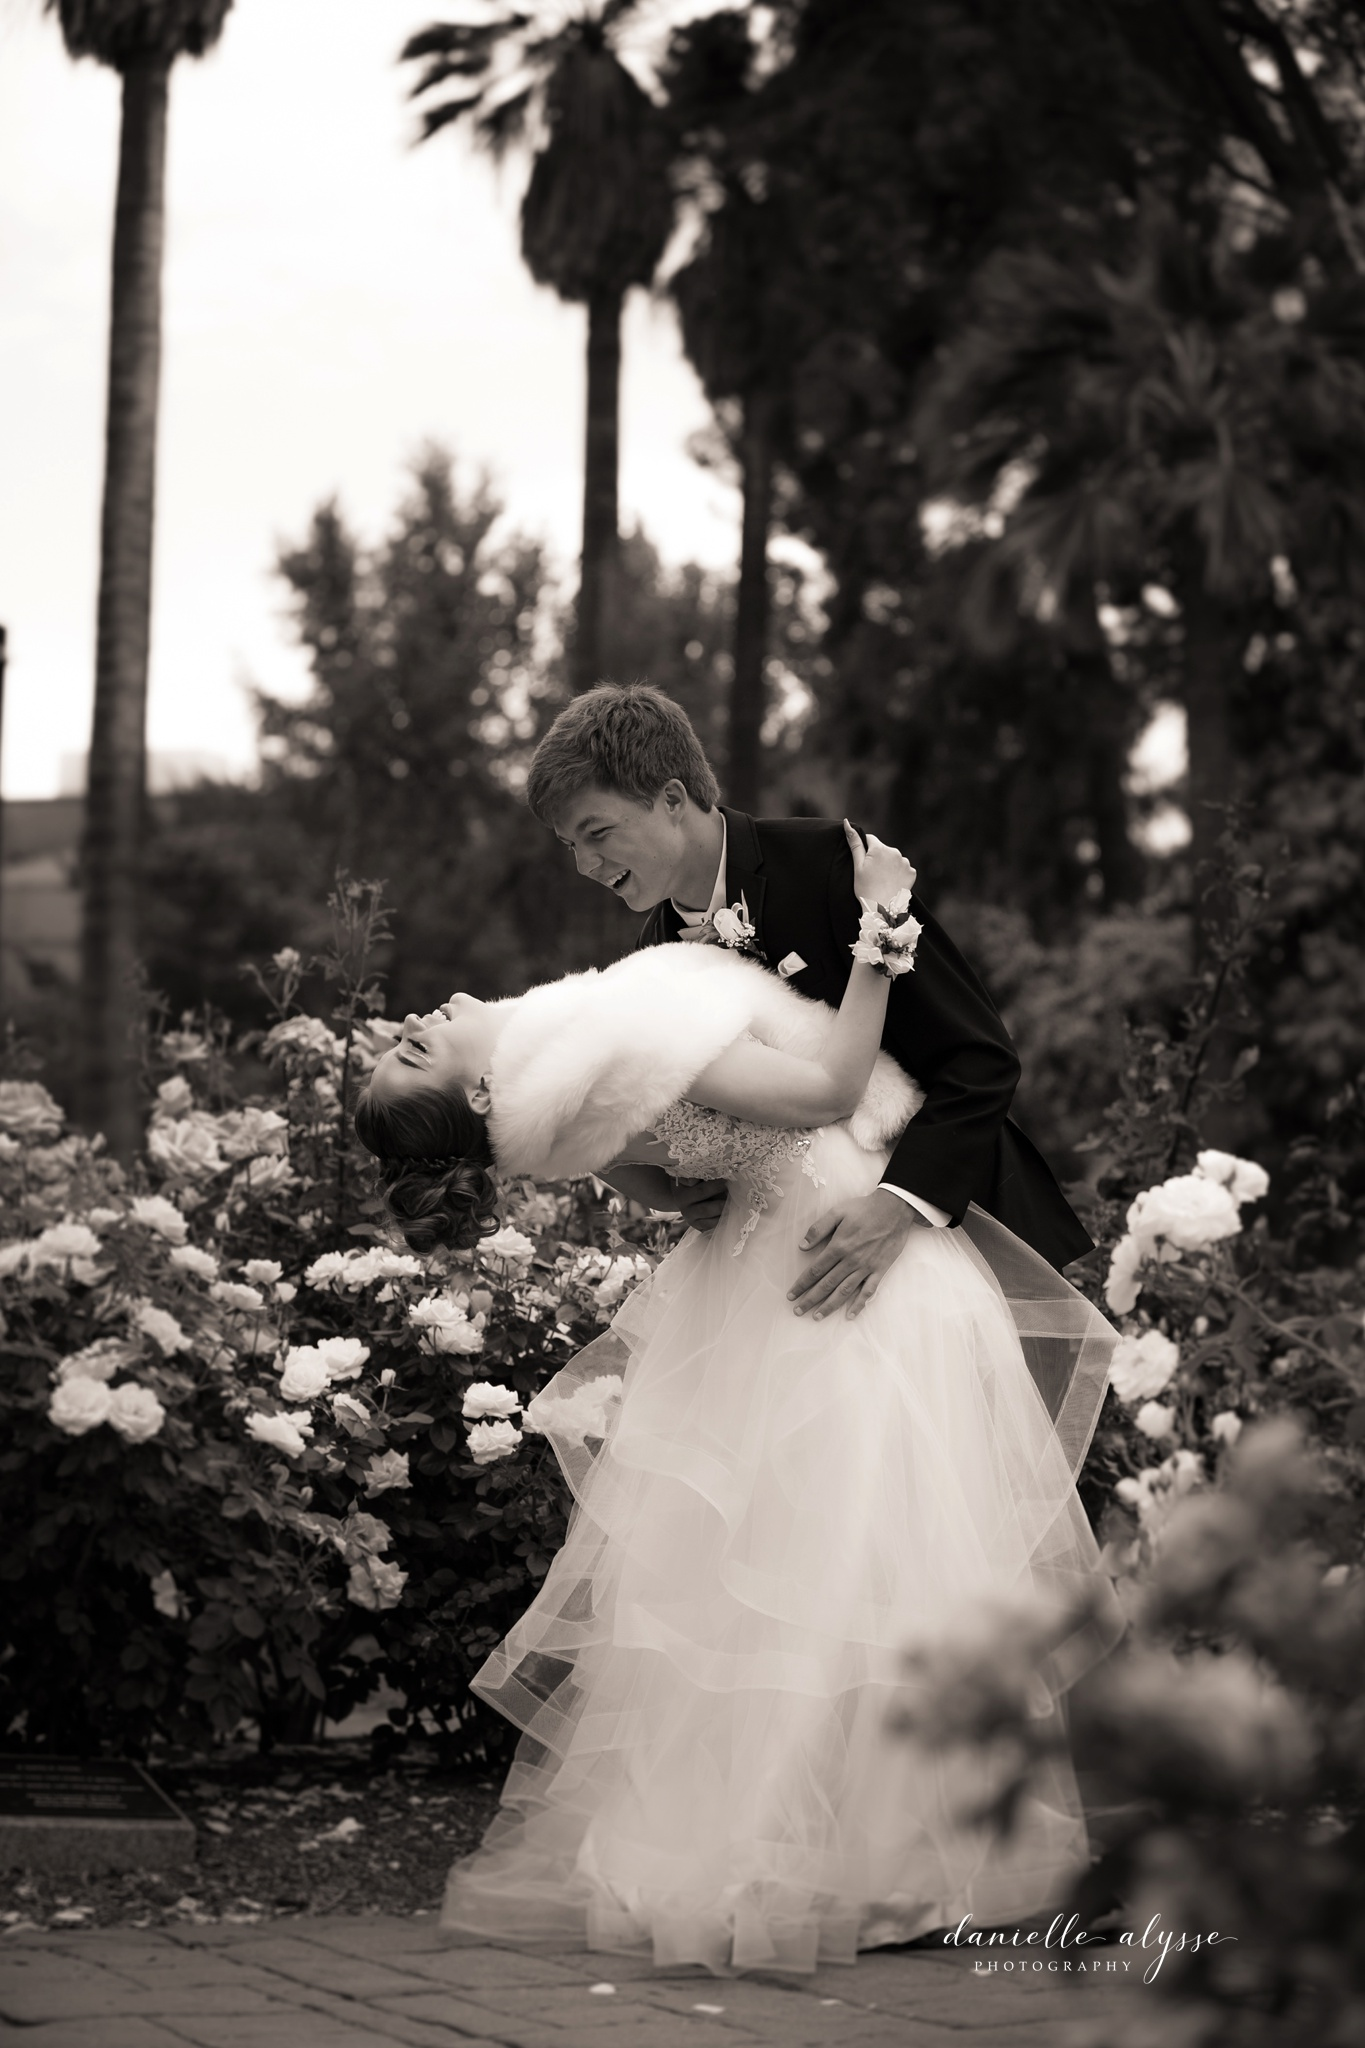 180428_prom_senior_ball_capitol_rose_danielle_alysse_photography_sacramento_photographer_blog_27_WEB.jpg